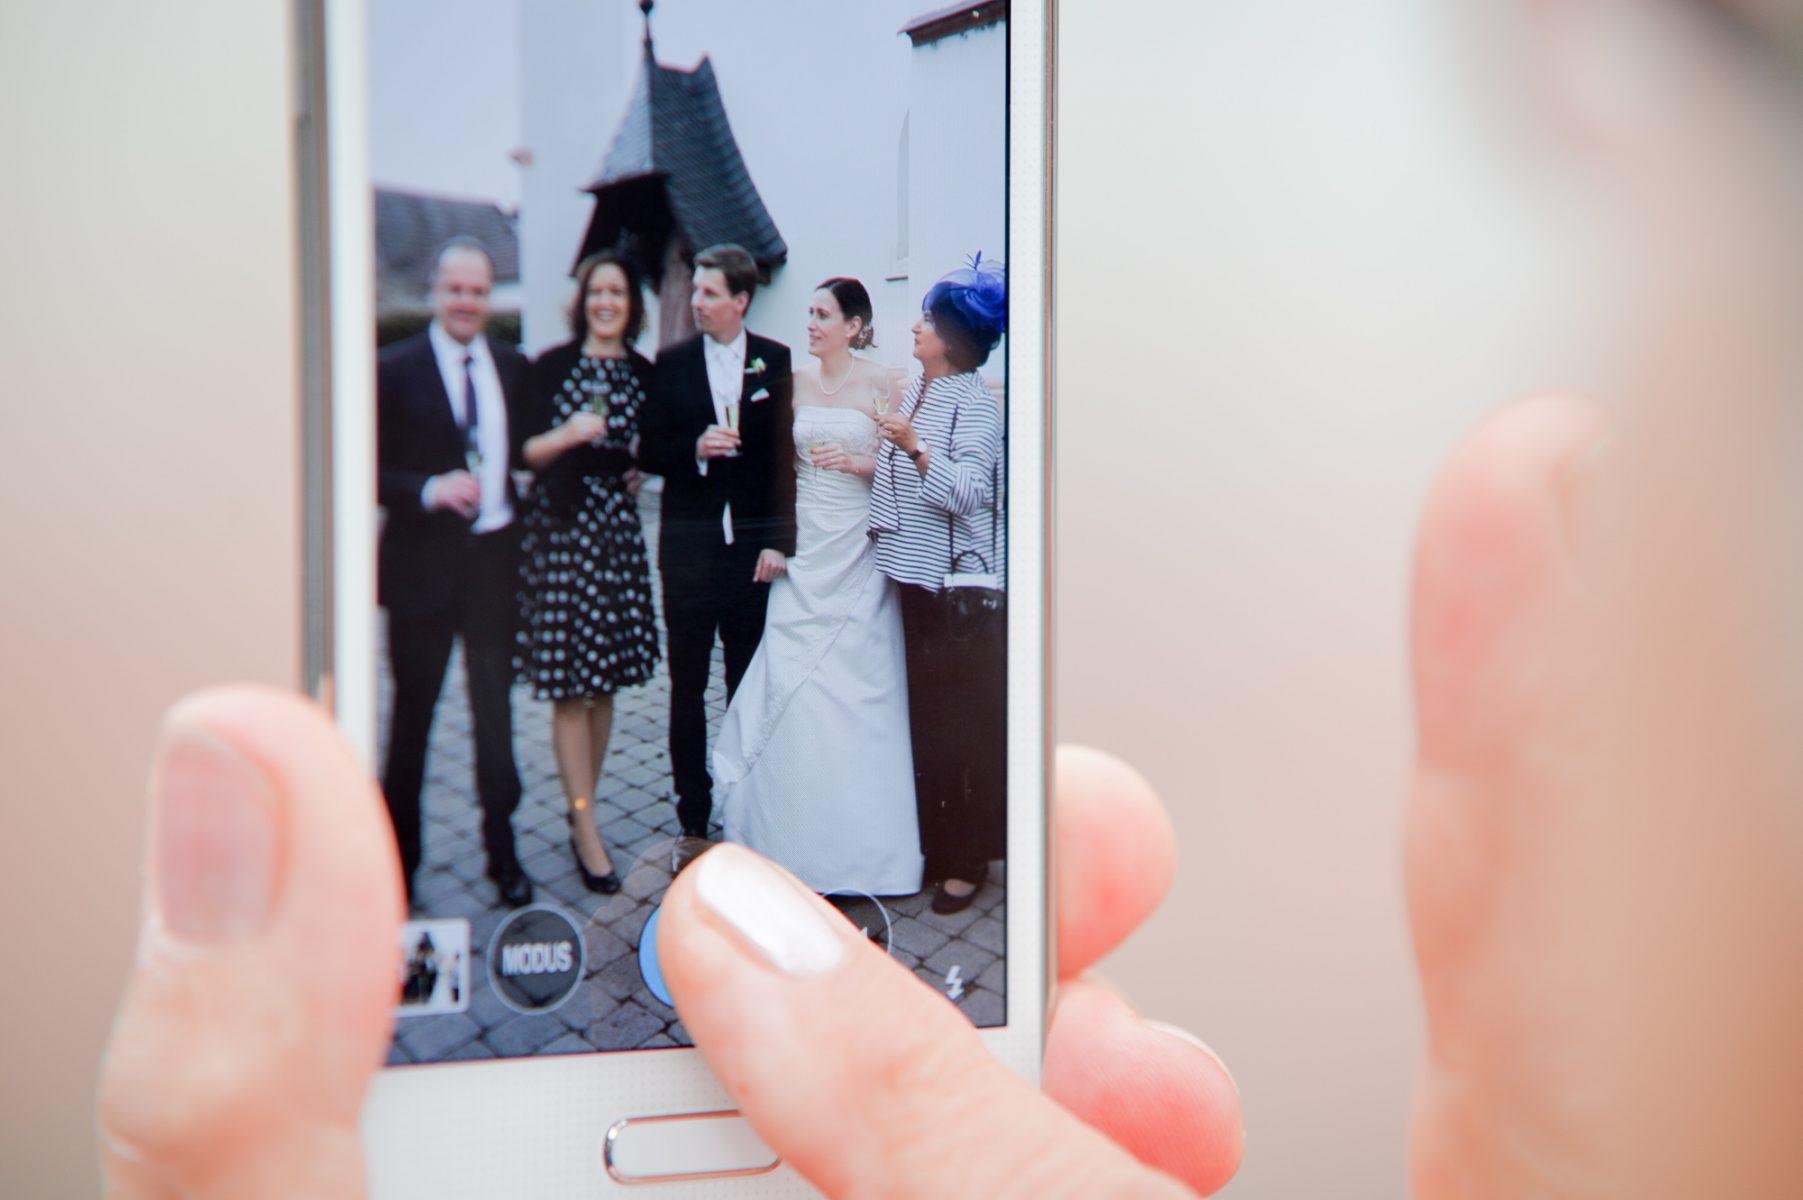 Hochzeit Feier  B2000 3583 1803x1200 - Trauung